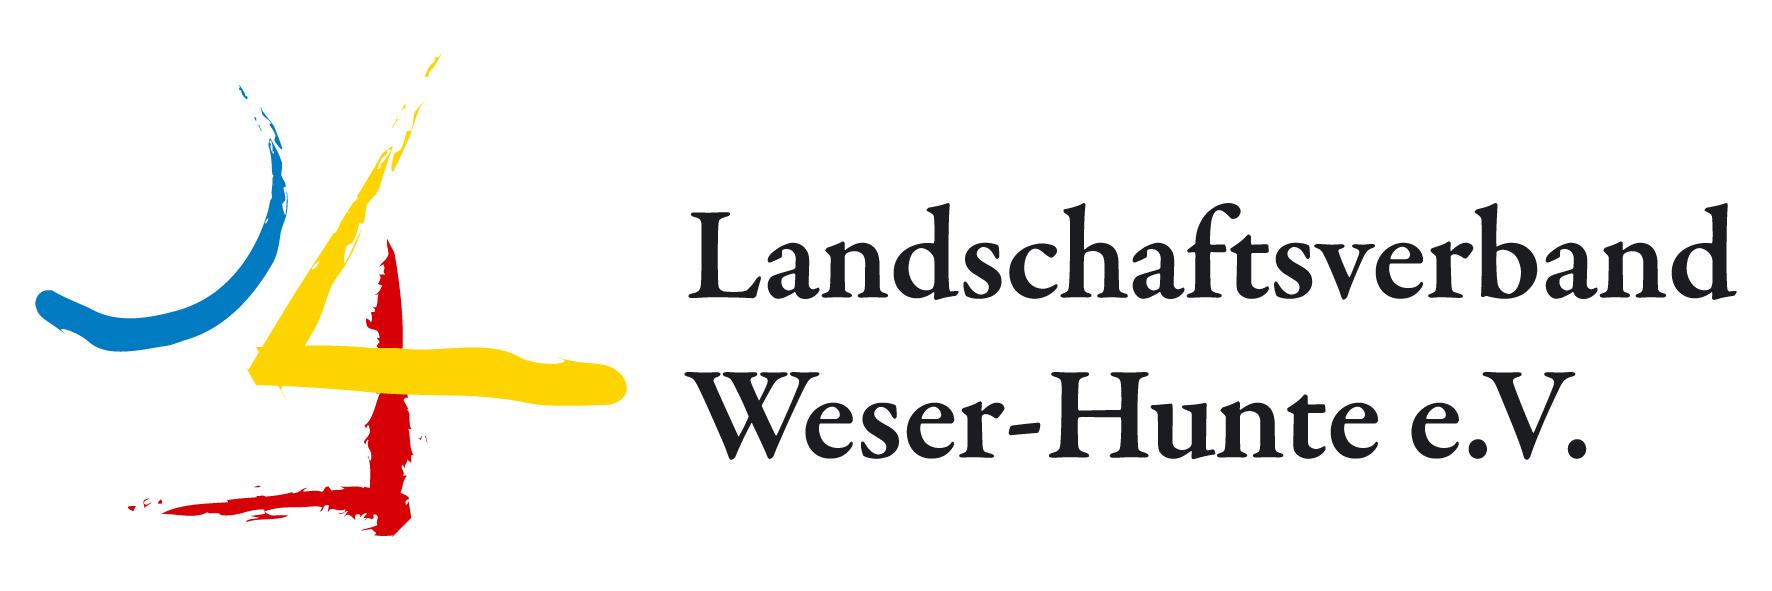 Landschaftsverband Weser Hunte